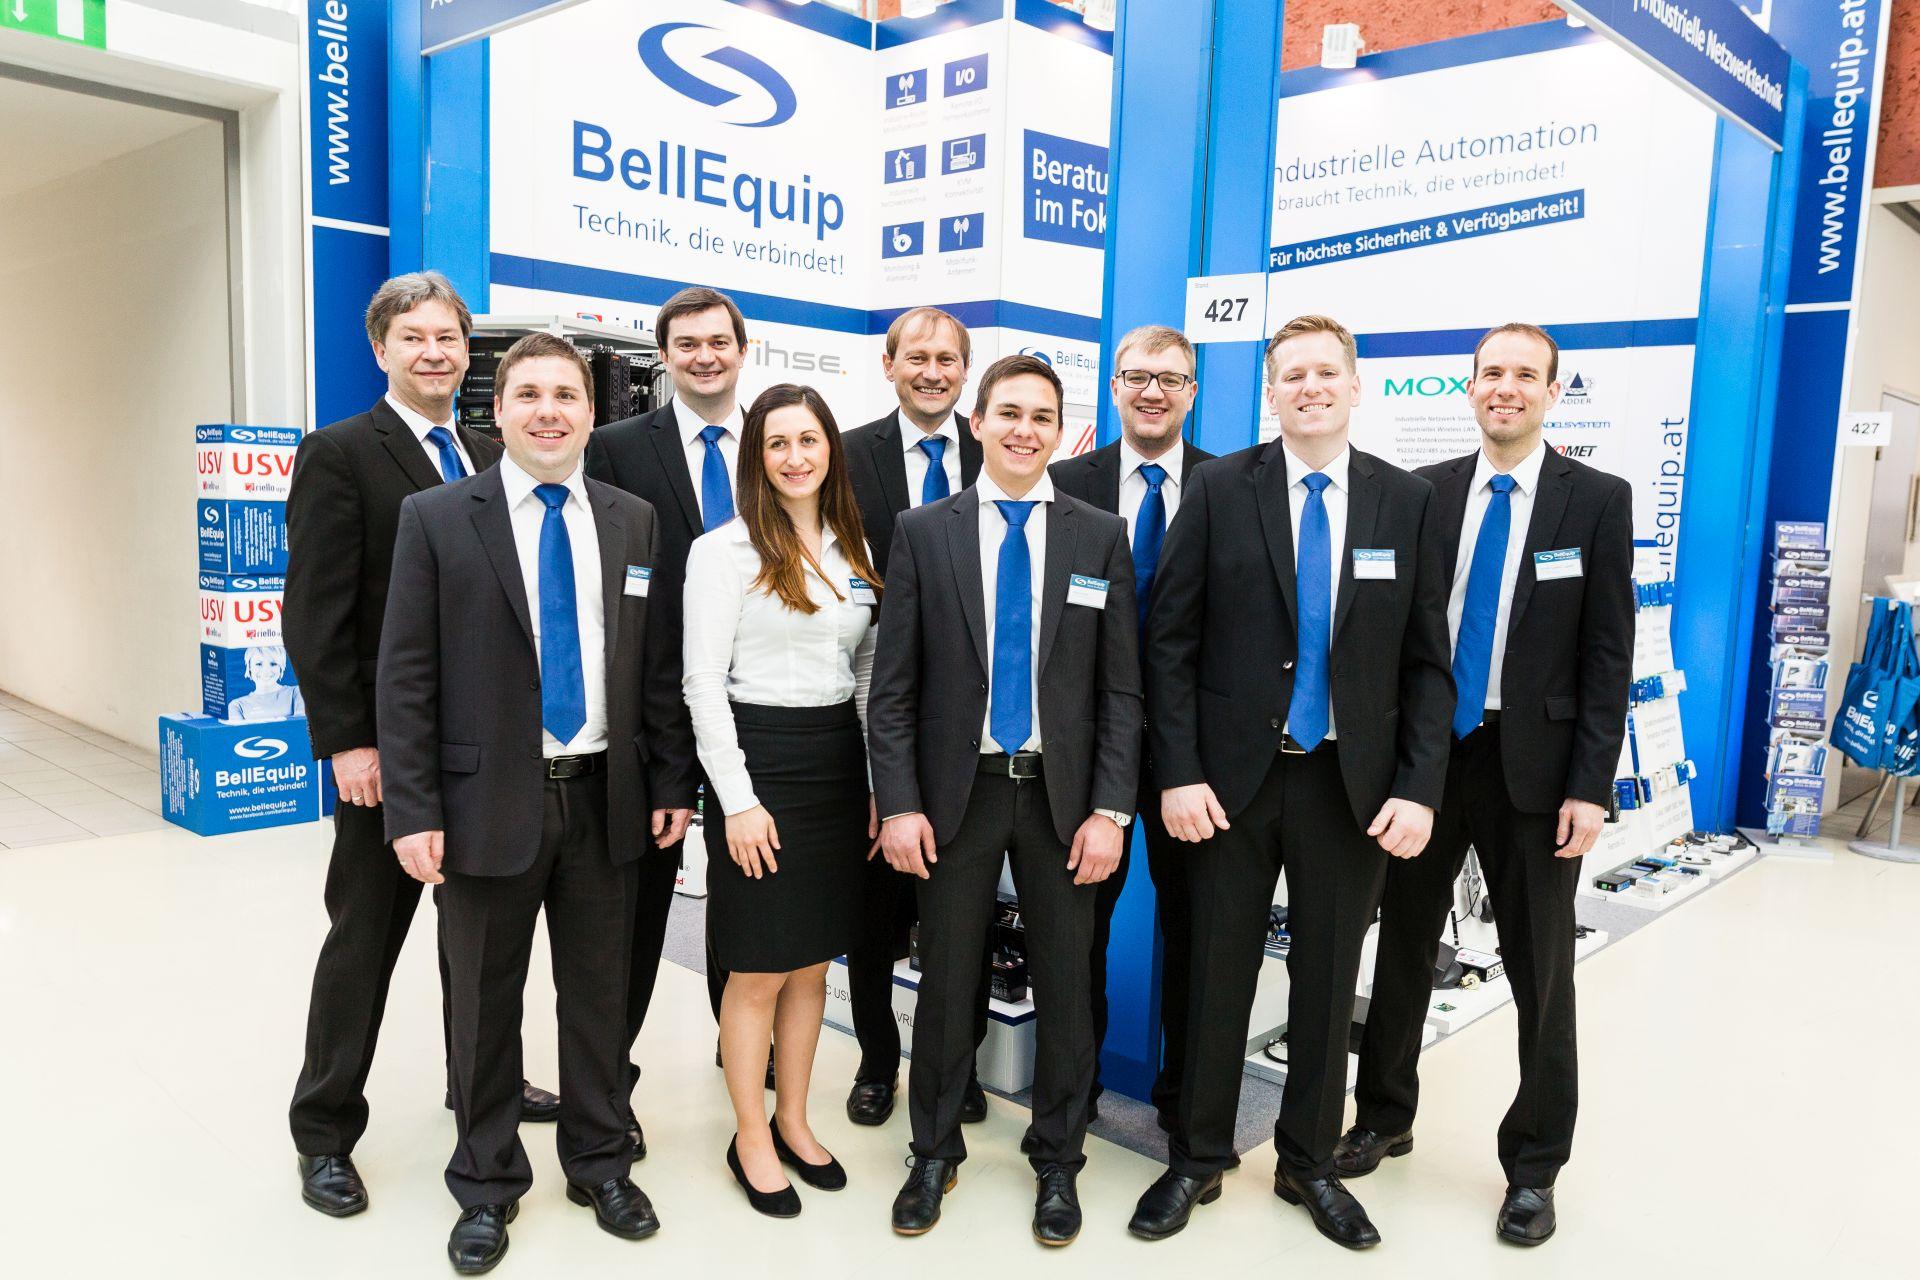 bellequip-smart-automation-2017-messeteam